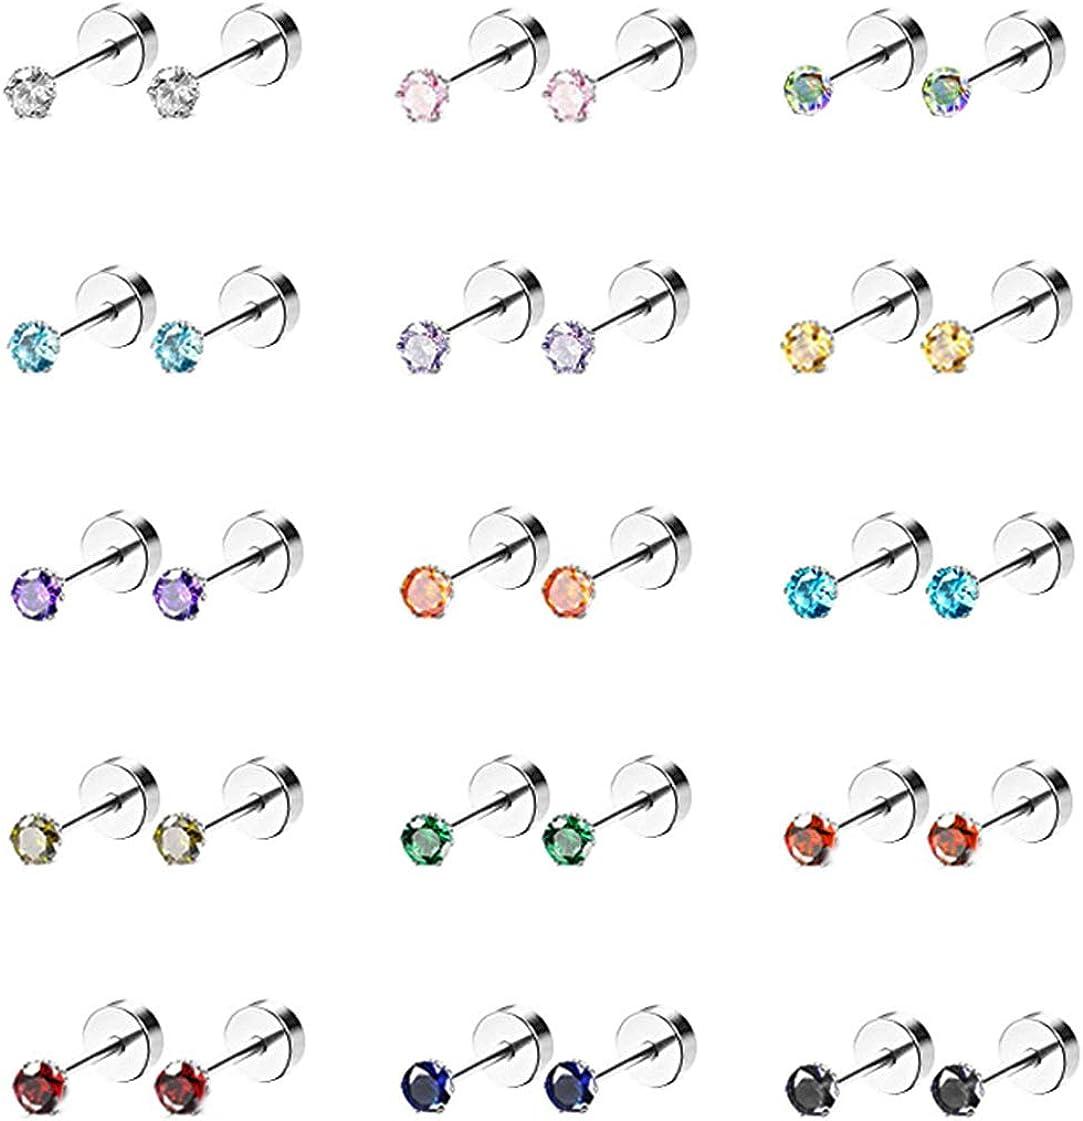 Masedy 15 Pairs 20G 316L Stainless Steel CZ Stud Earrings for Women Men Cartilage Screwback Earring Set 2-6mm